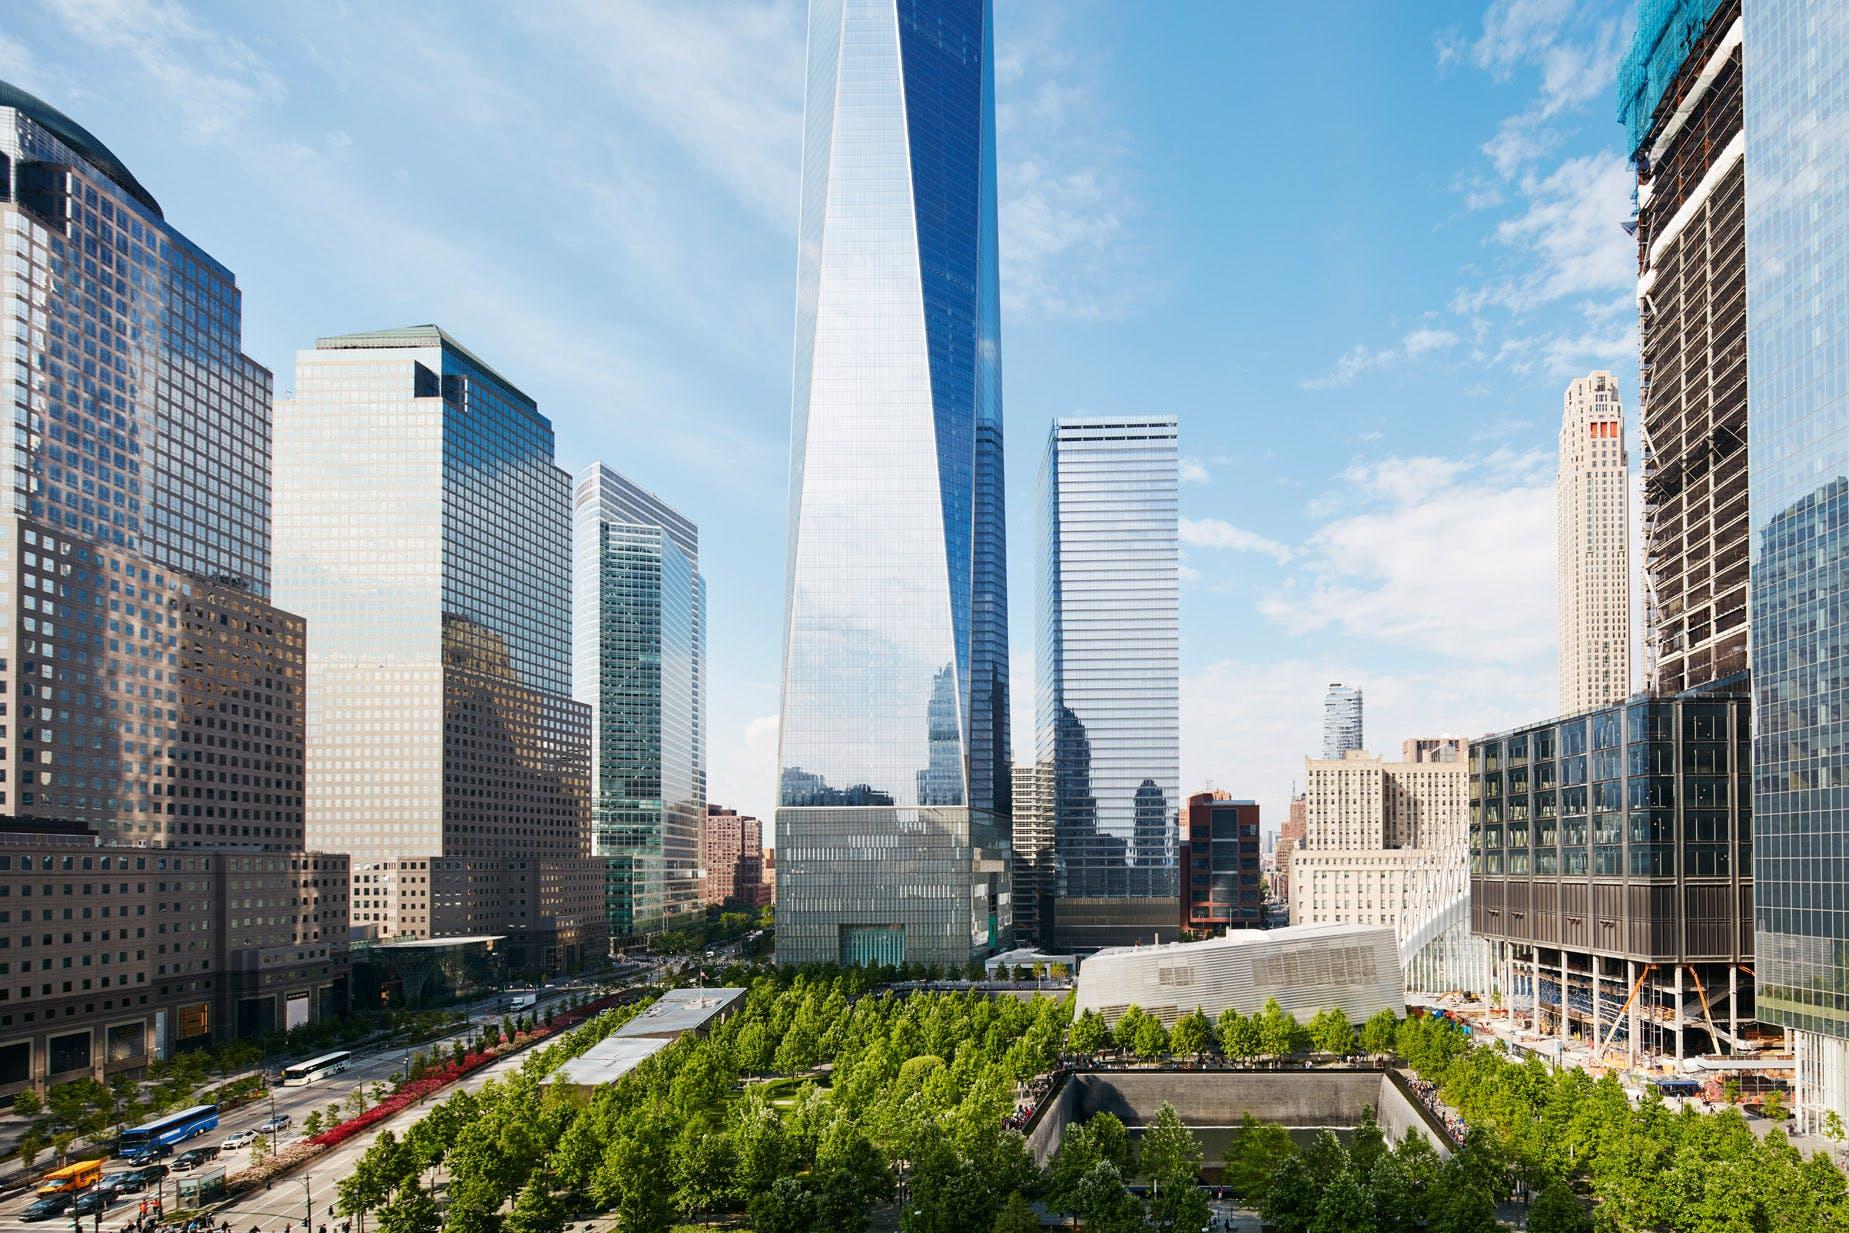 Lower Manhattan as seen from Club Quarters Hotel, World Trade Center